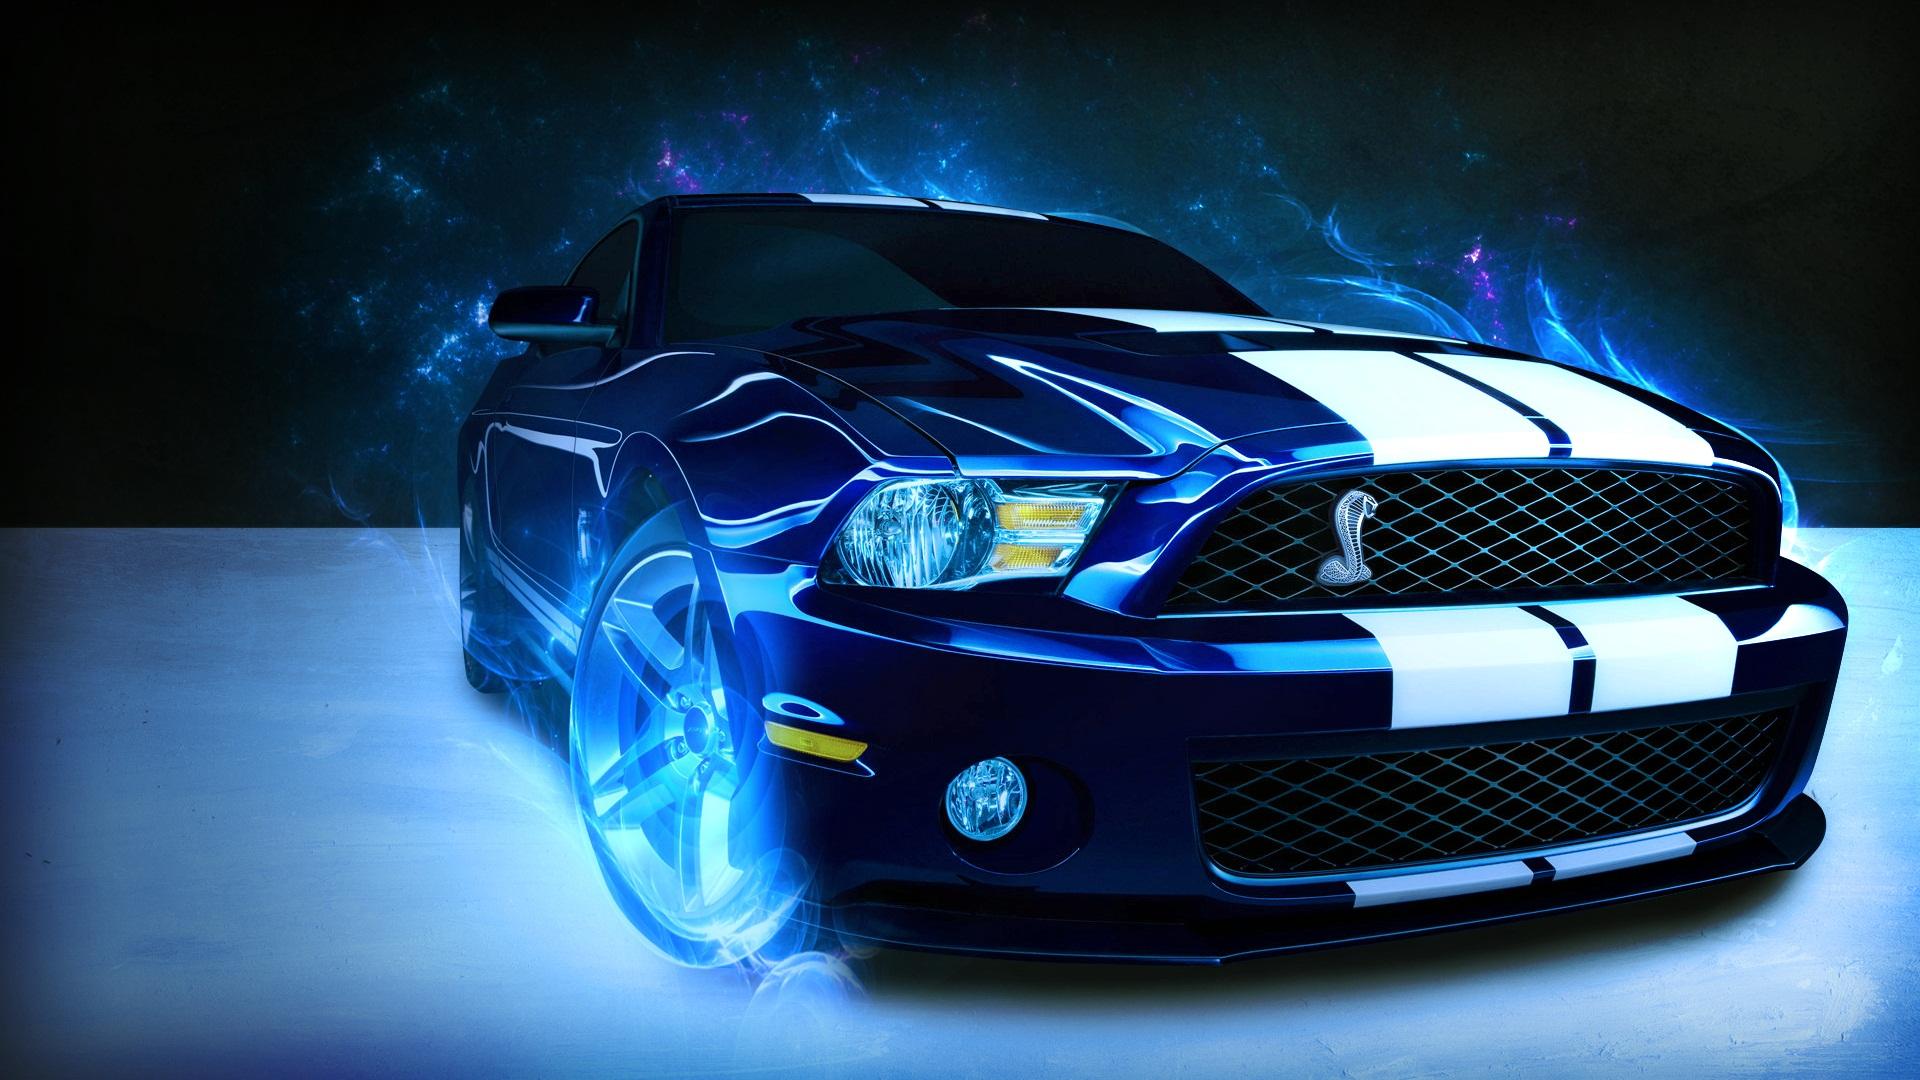 48 Ford Mustang Shelby Desktop Wallpaper On Wallpapersafari